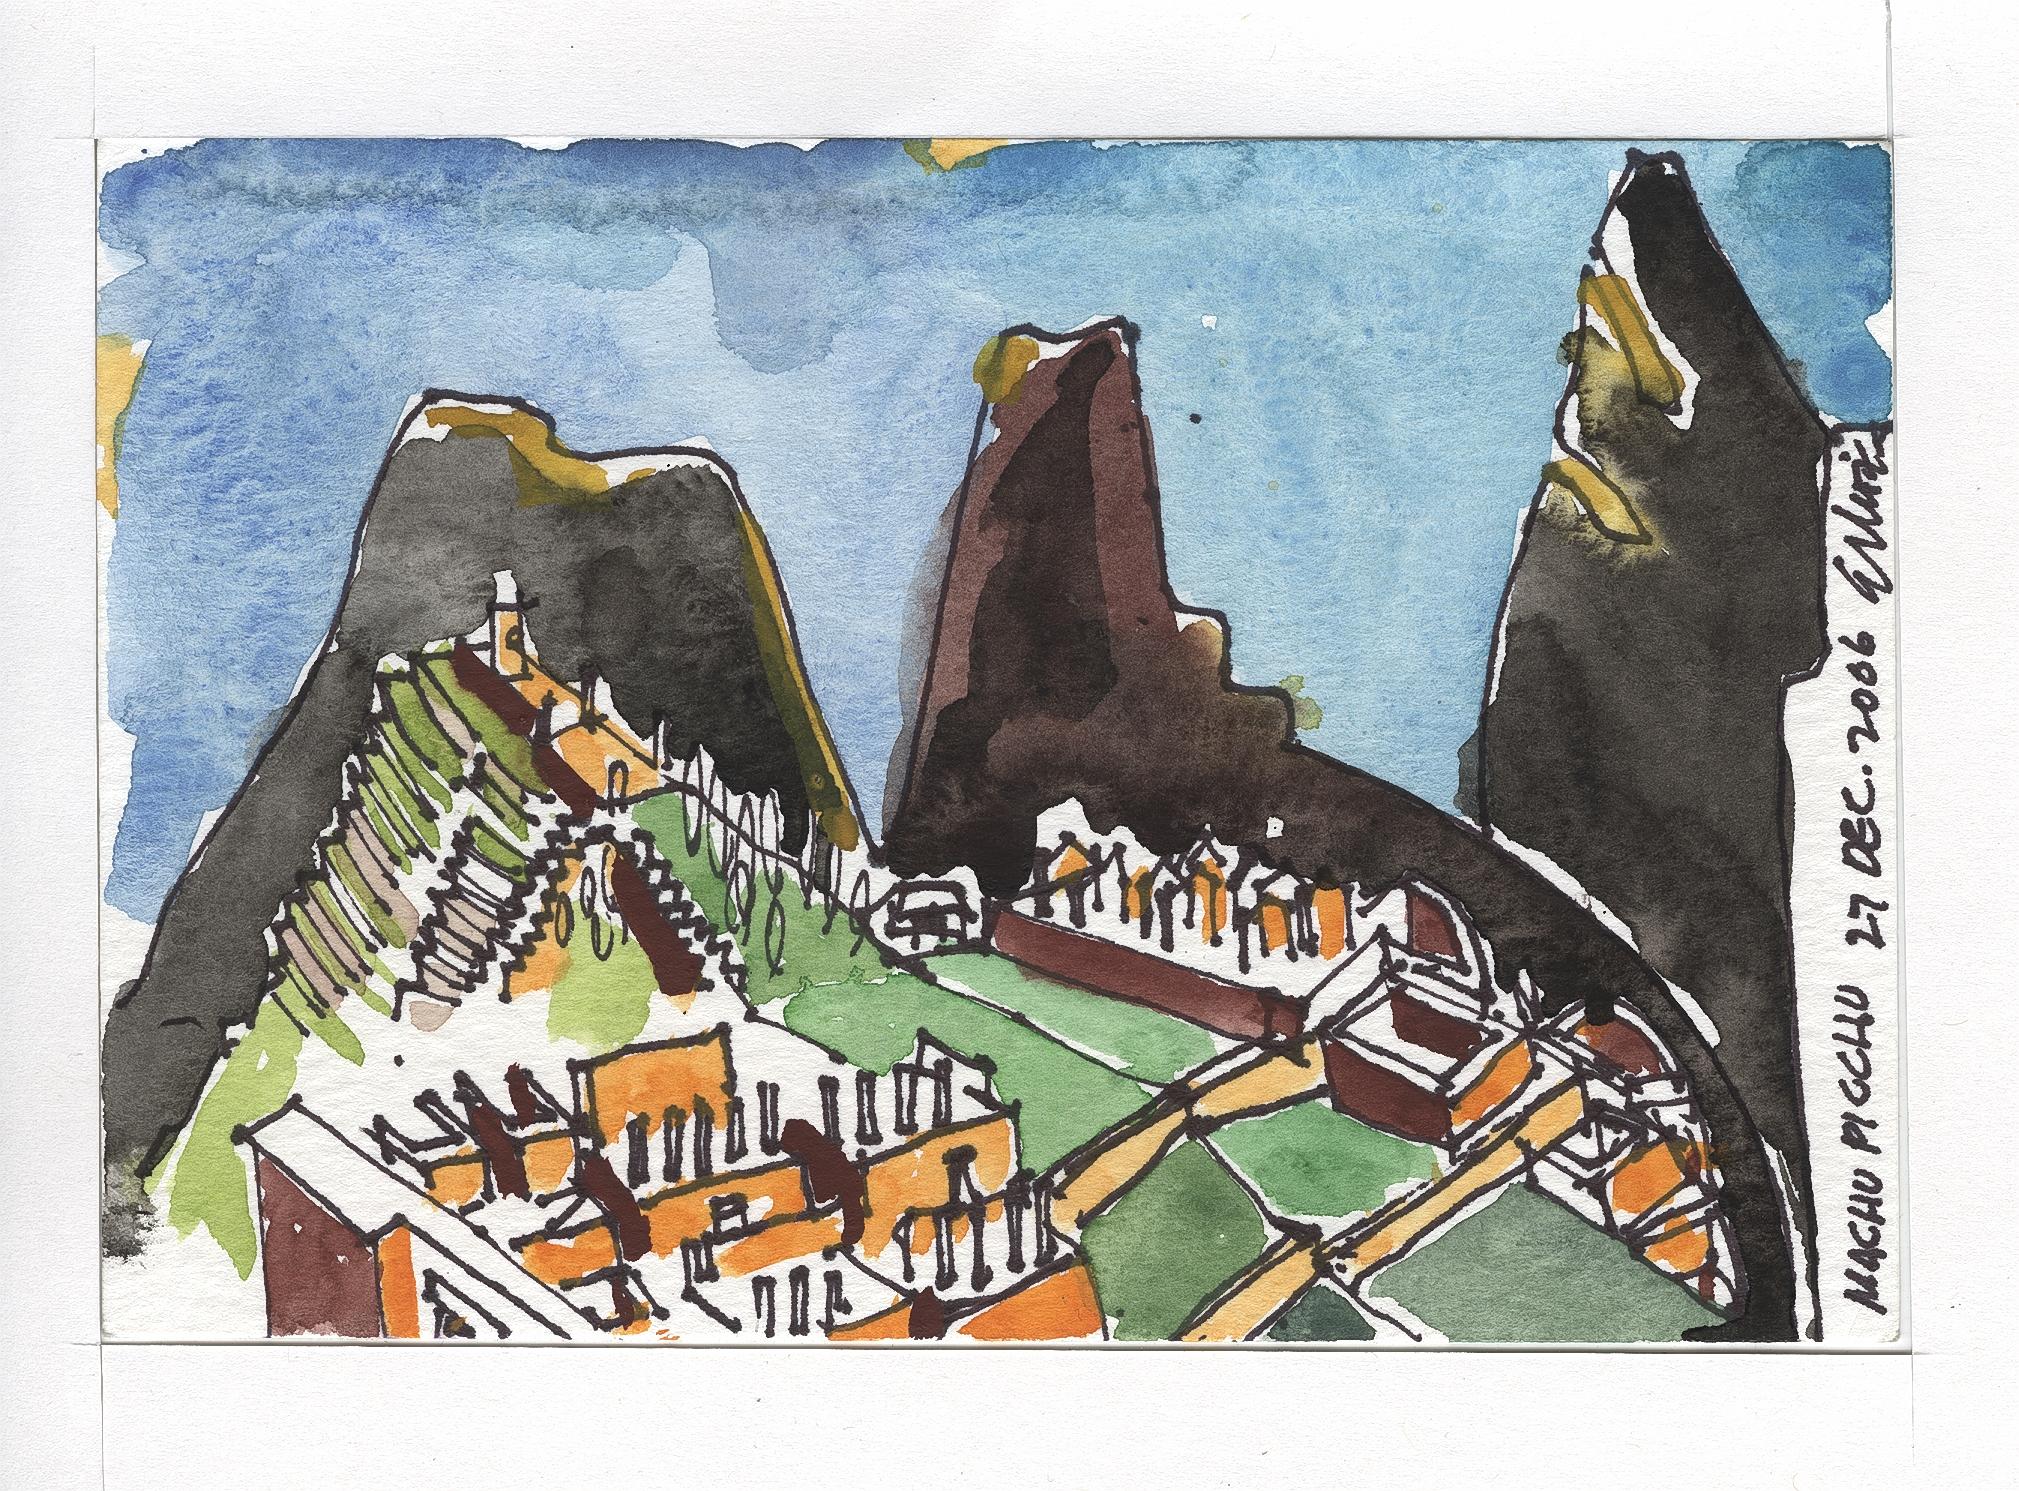 Macchu Pichu Three Peaks_122706.JPG